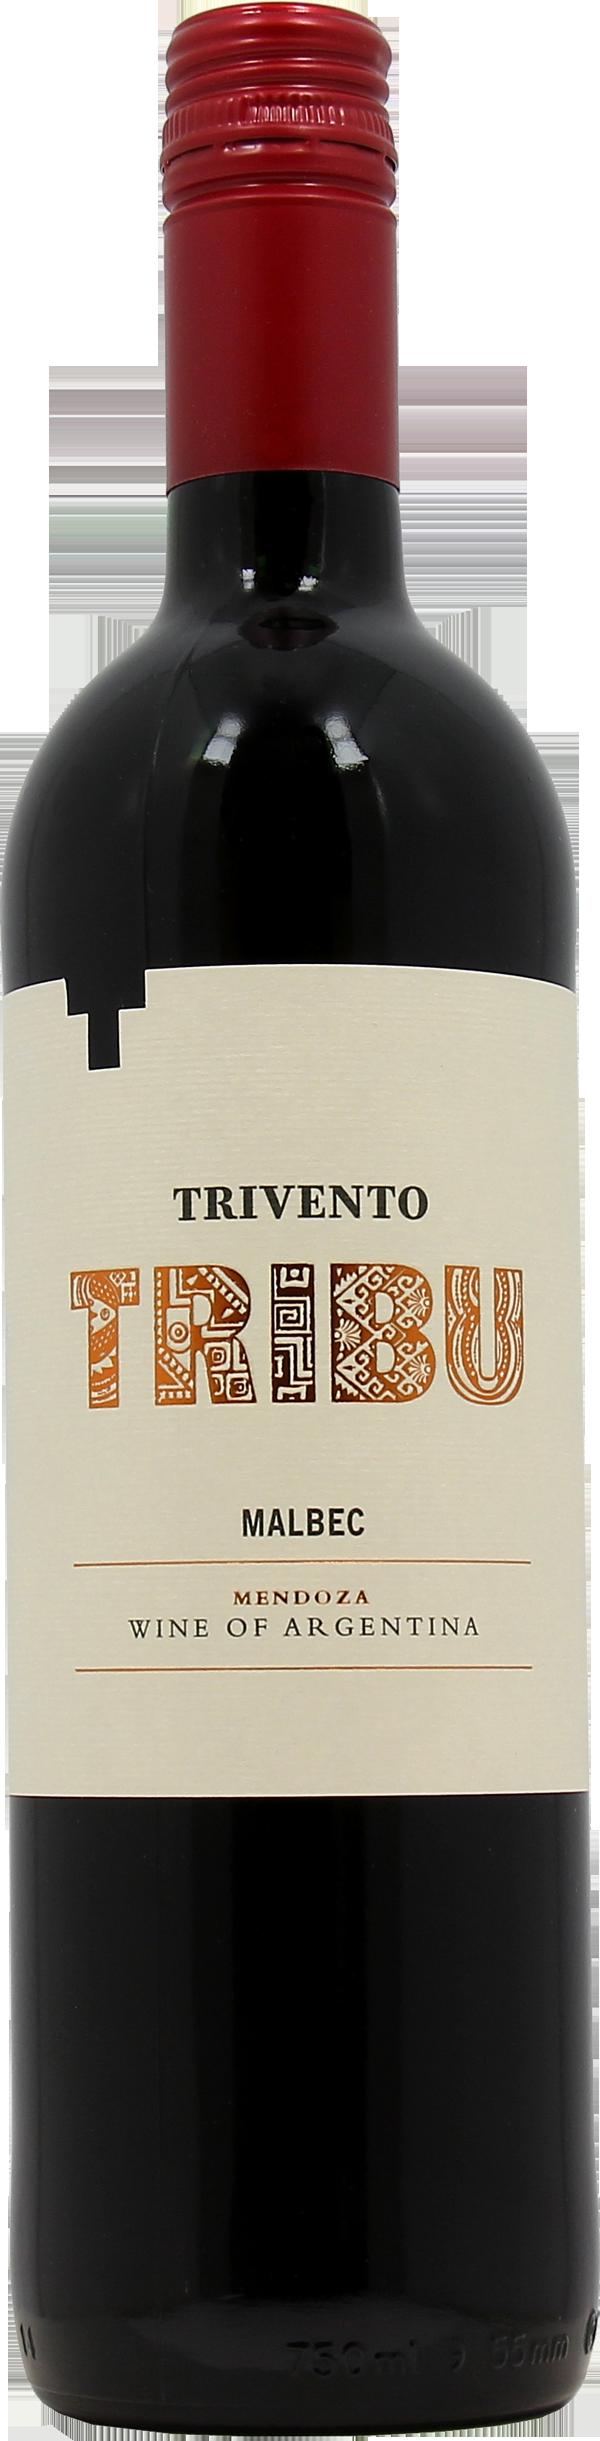 Image 0: Tribu Trivento Malbec